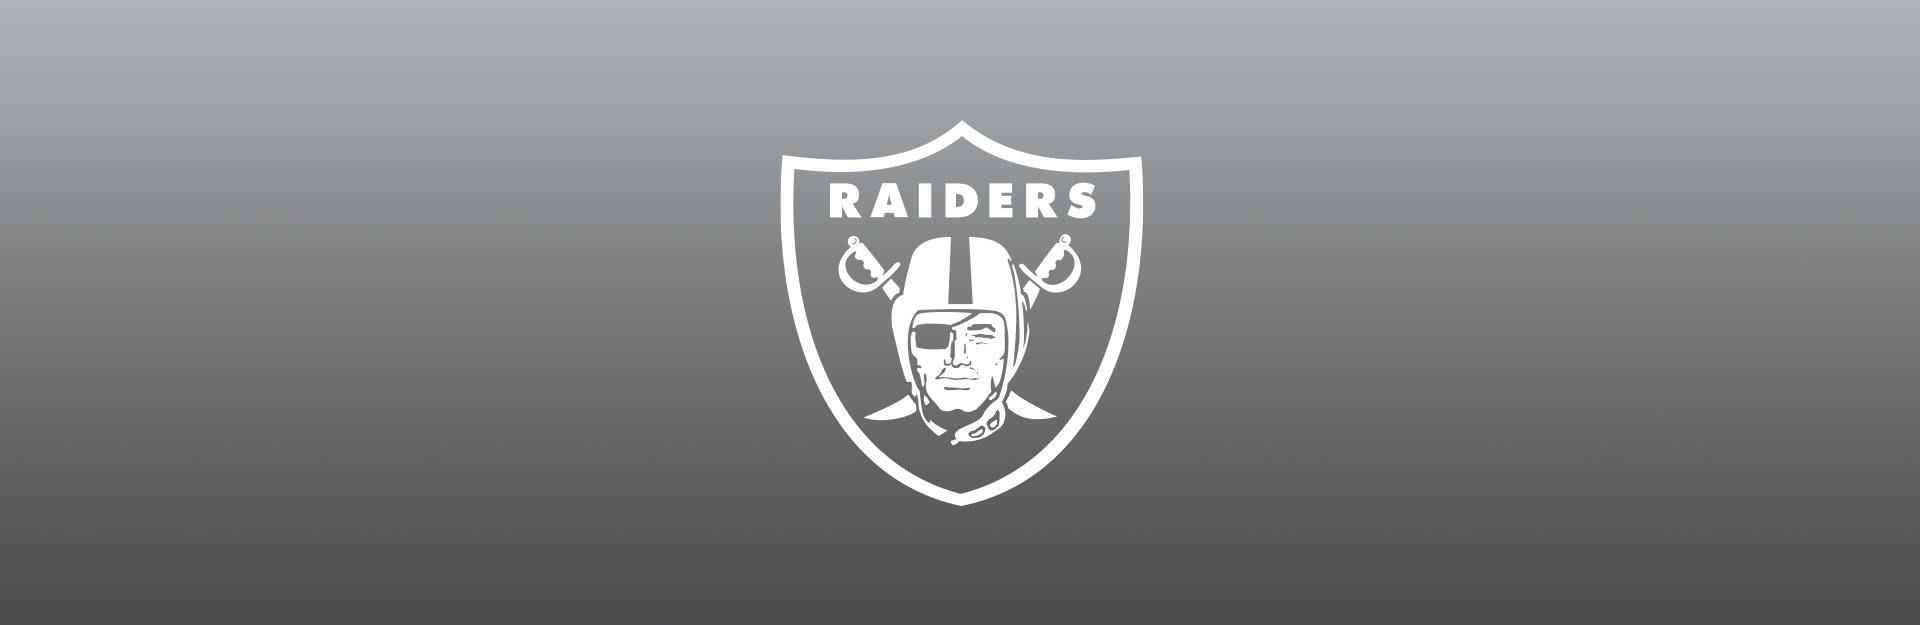 Las Vegas Raiders logo on gray background